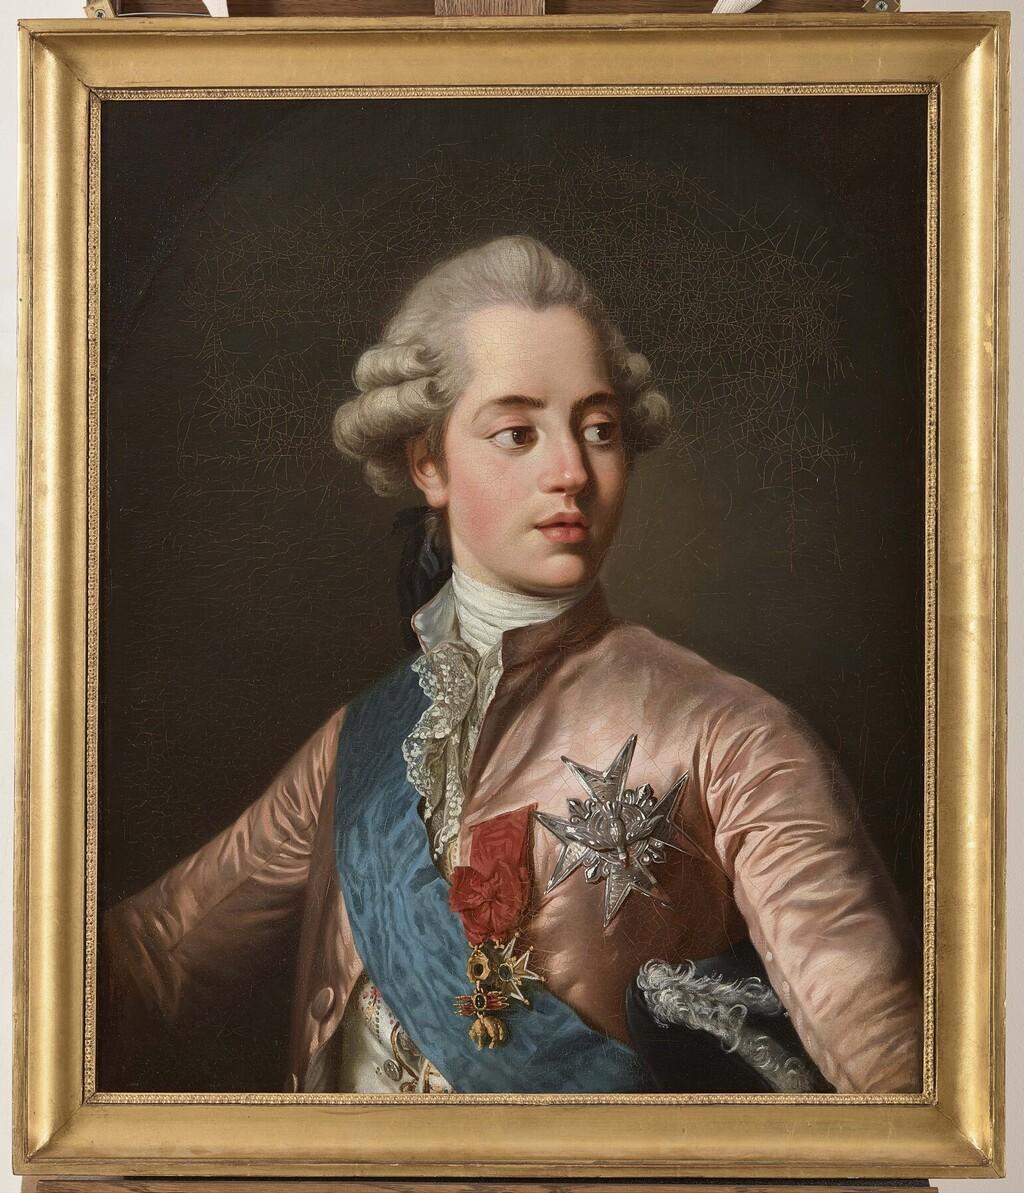 Le comte Charles-Philippe d'Artois, futur Charles X - Page 4 Image256